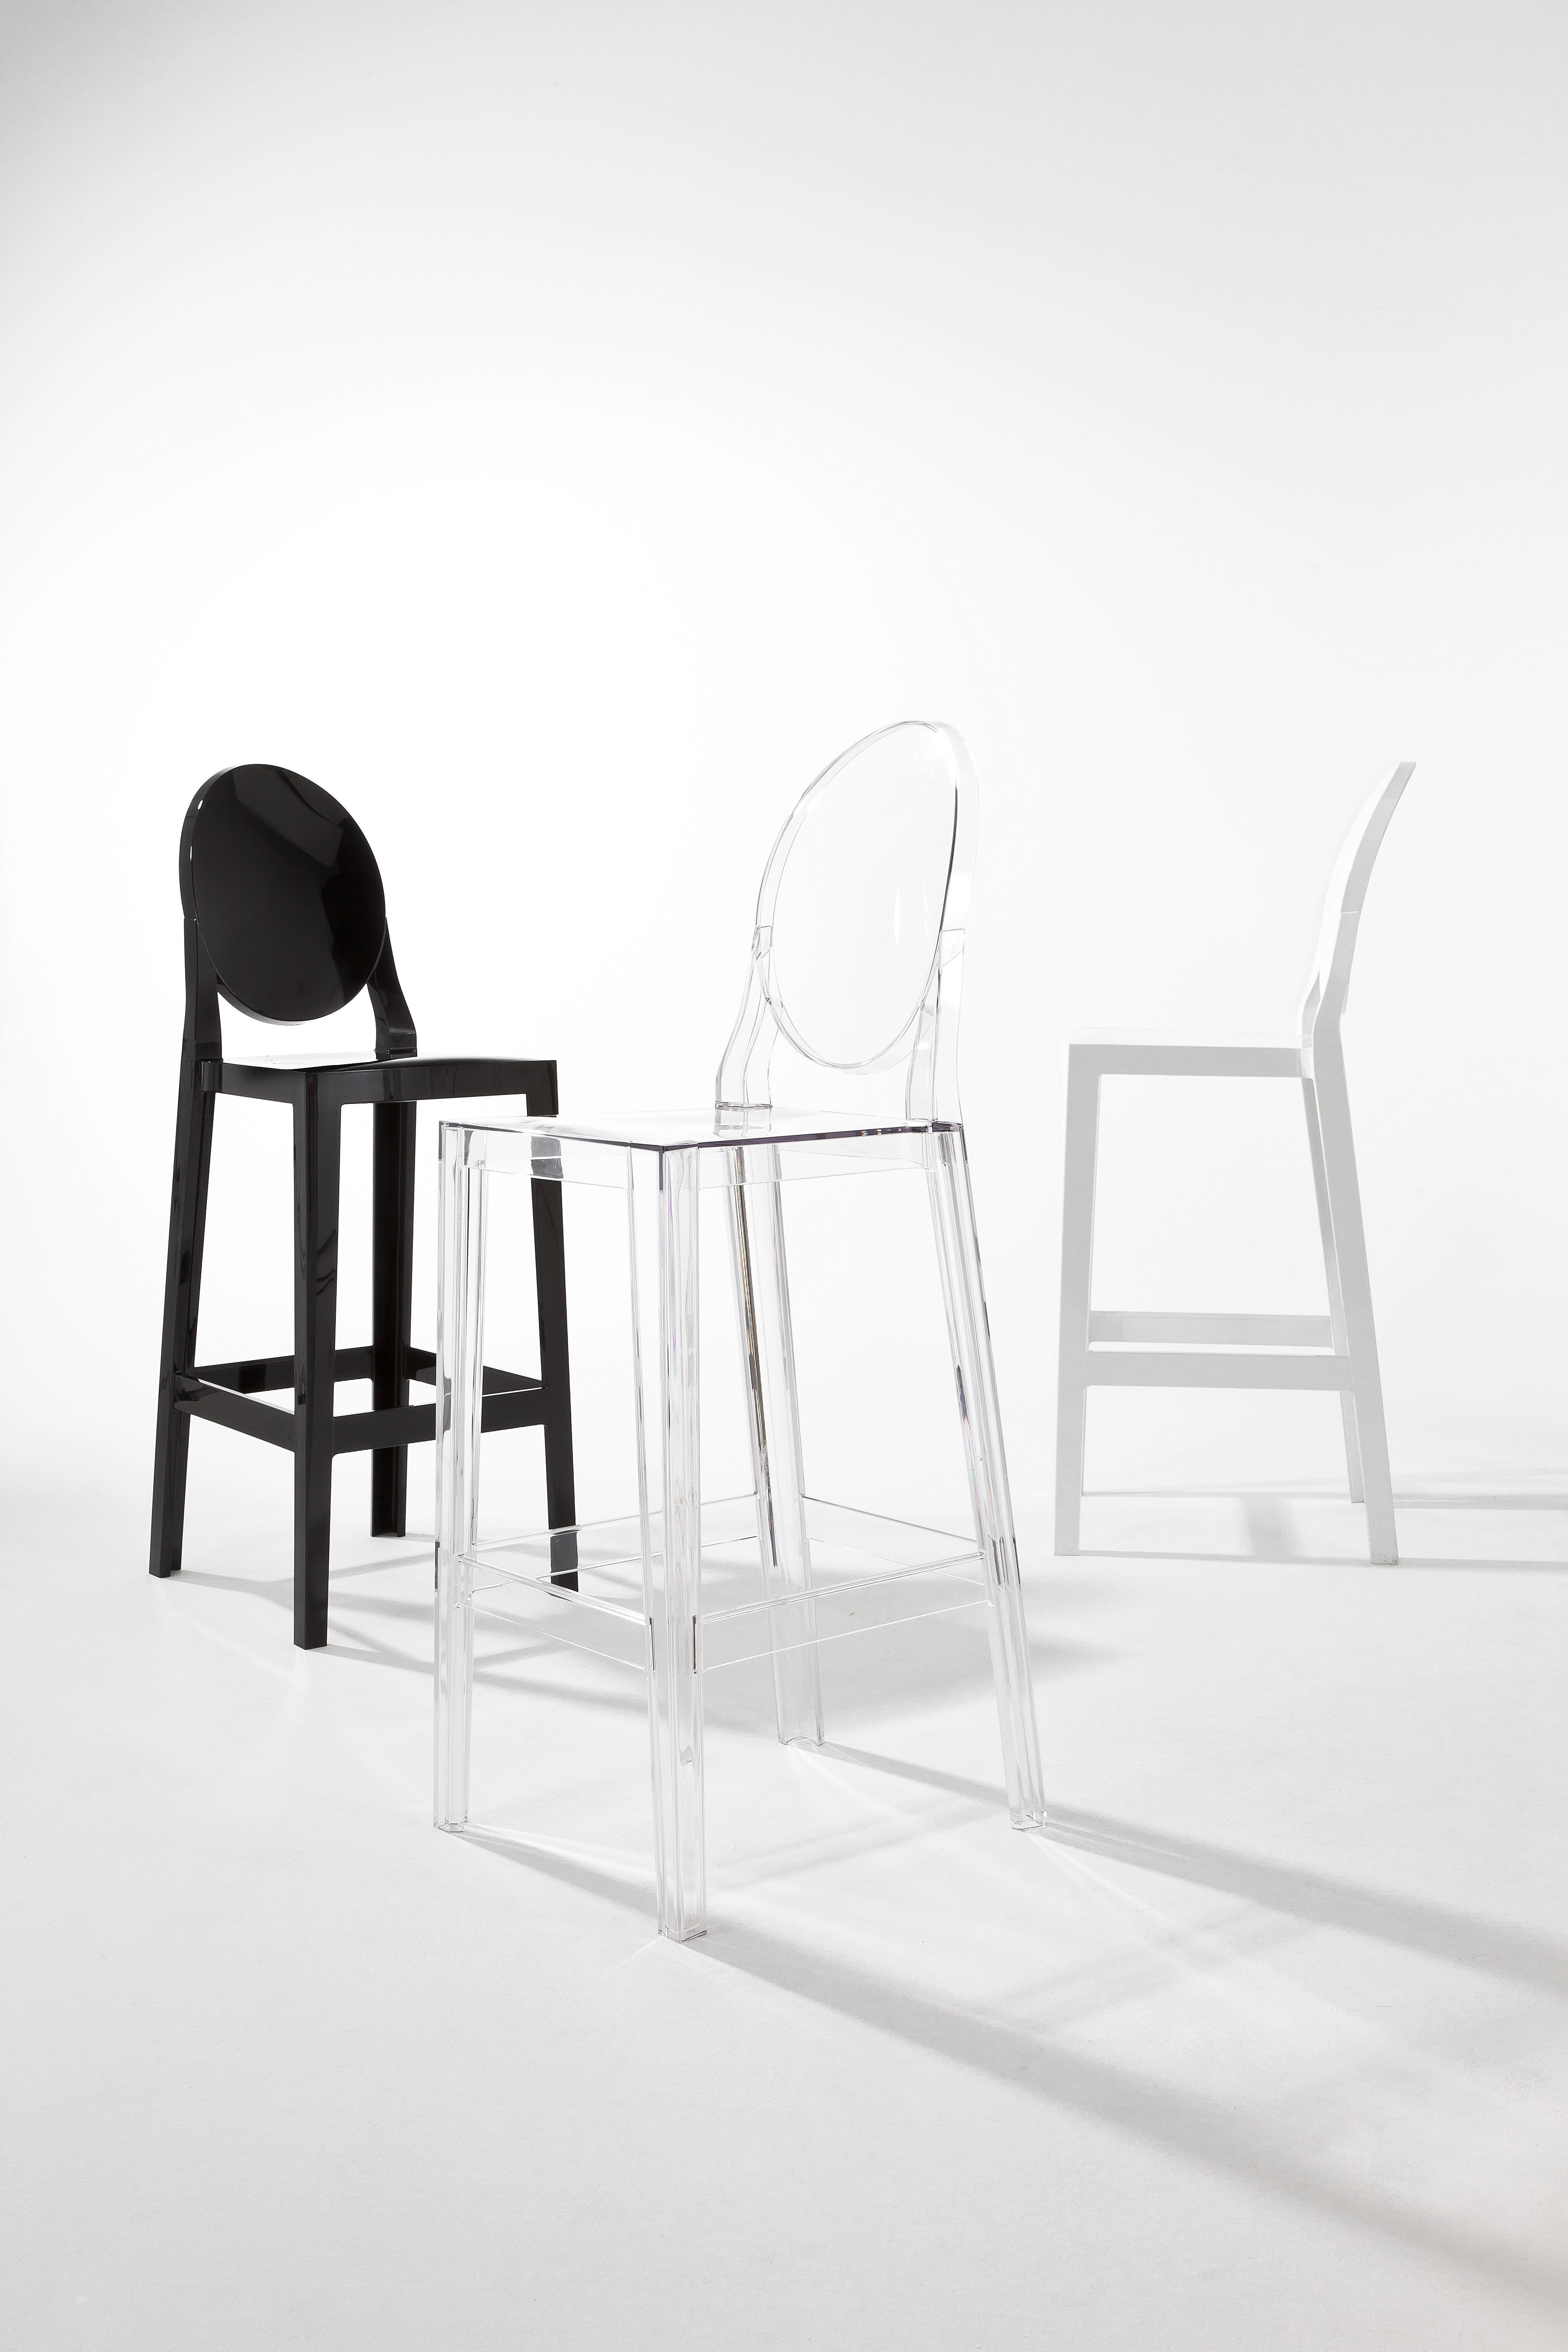 one more bar chair - h 65cm - plastic cristalkartell